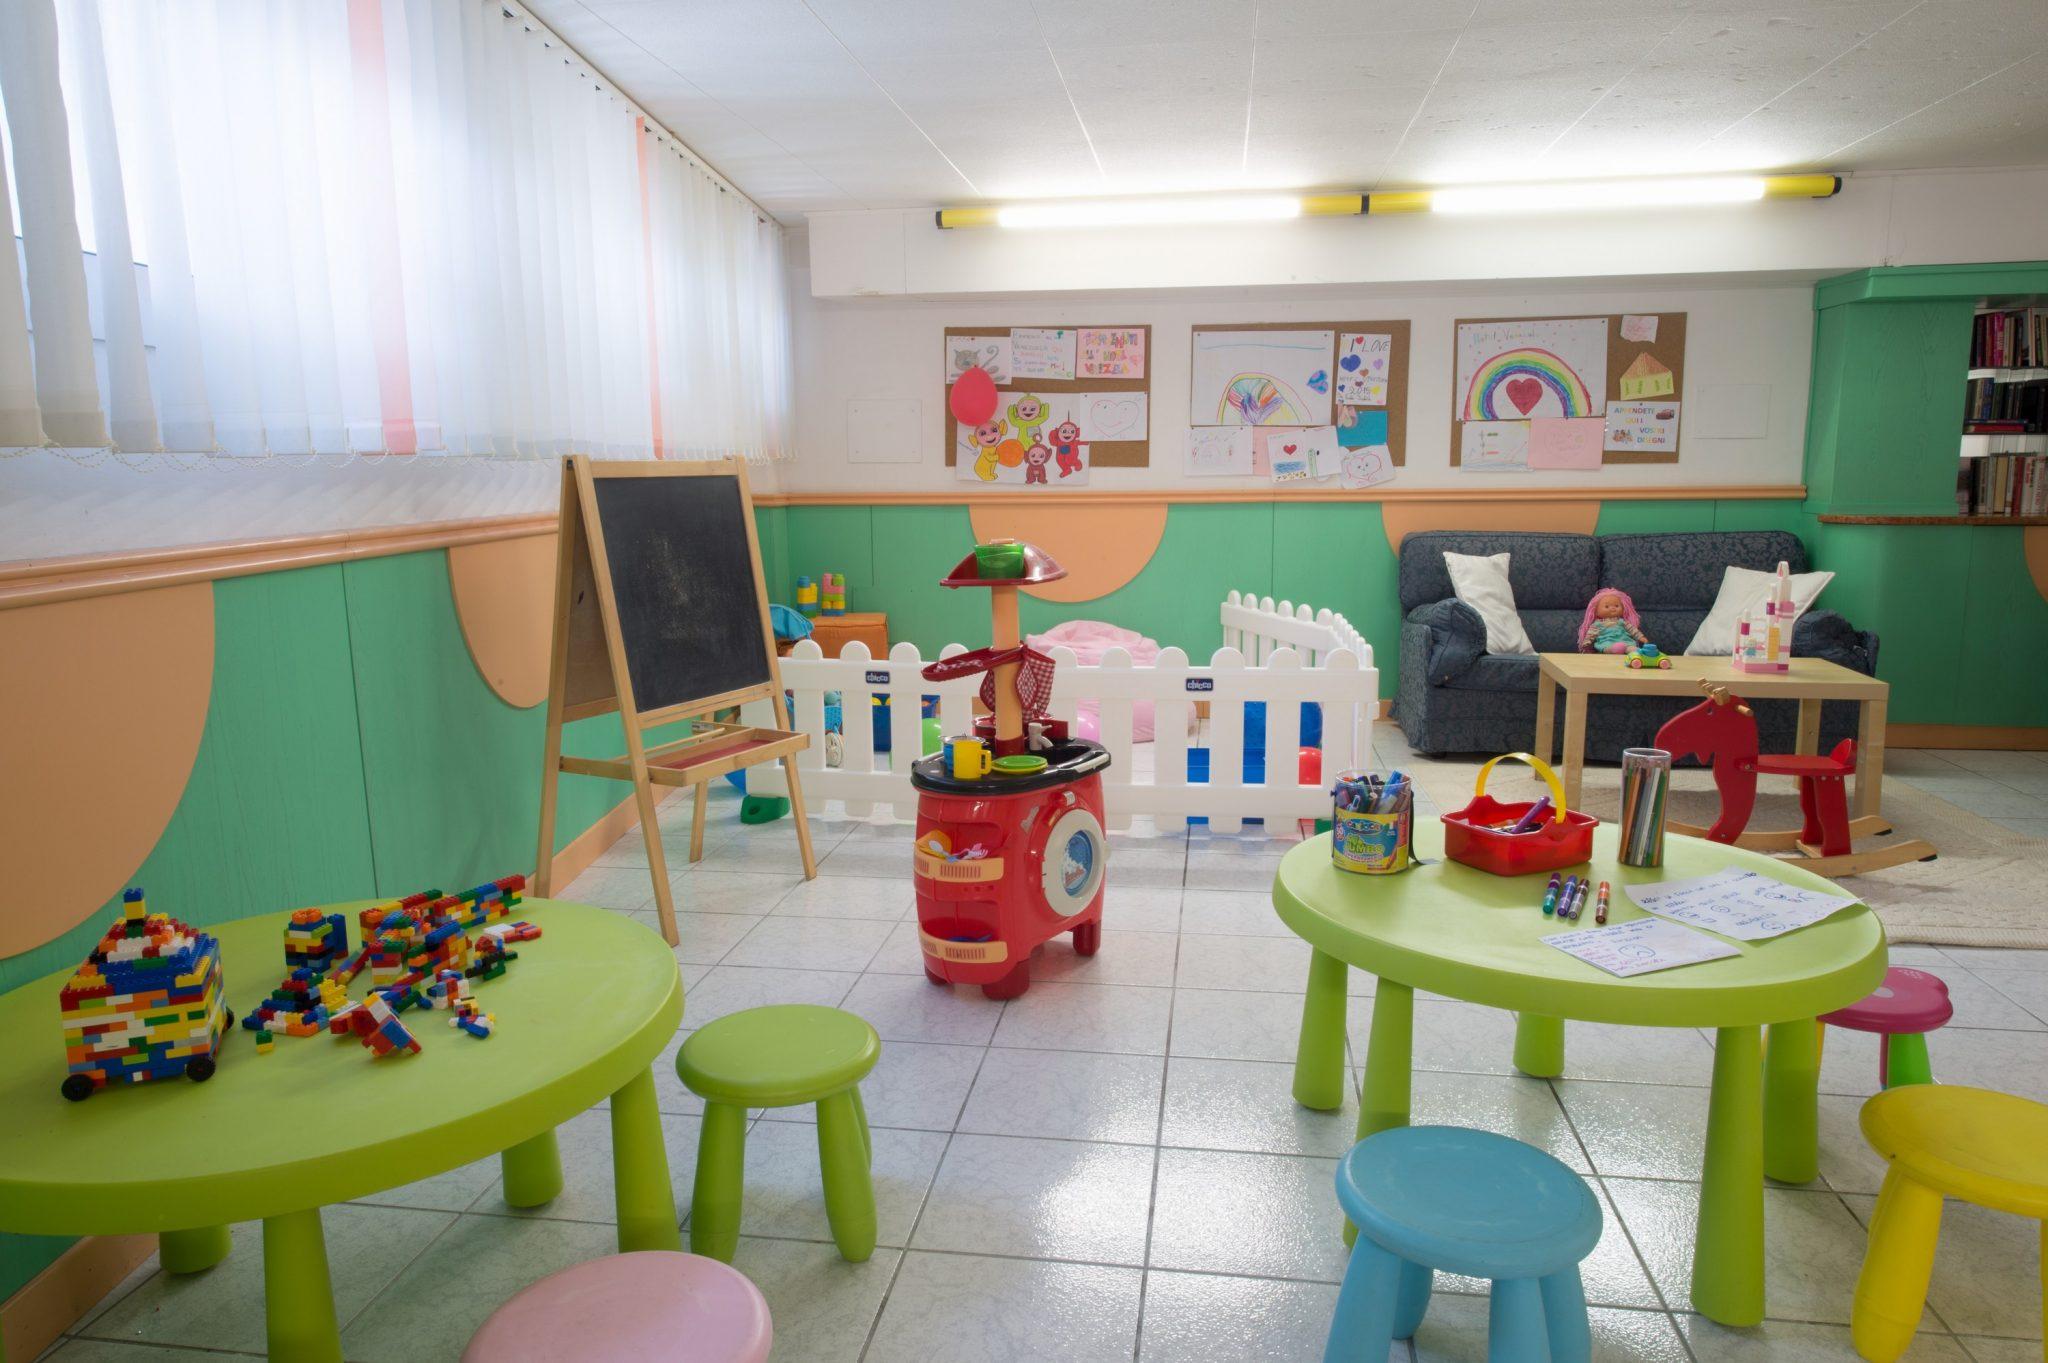 http://www.hotelvenezuela.it/wp-content/uploads/2016/11/mini-HVE_0169.jpg